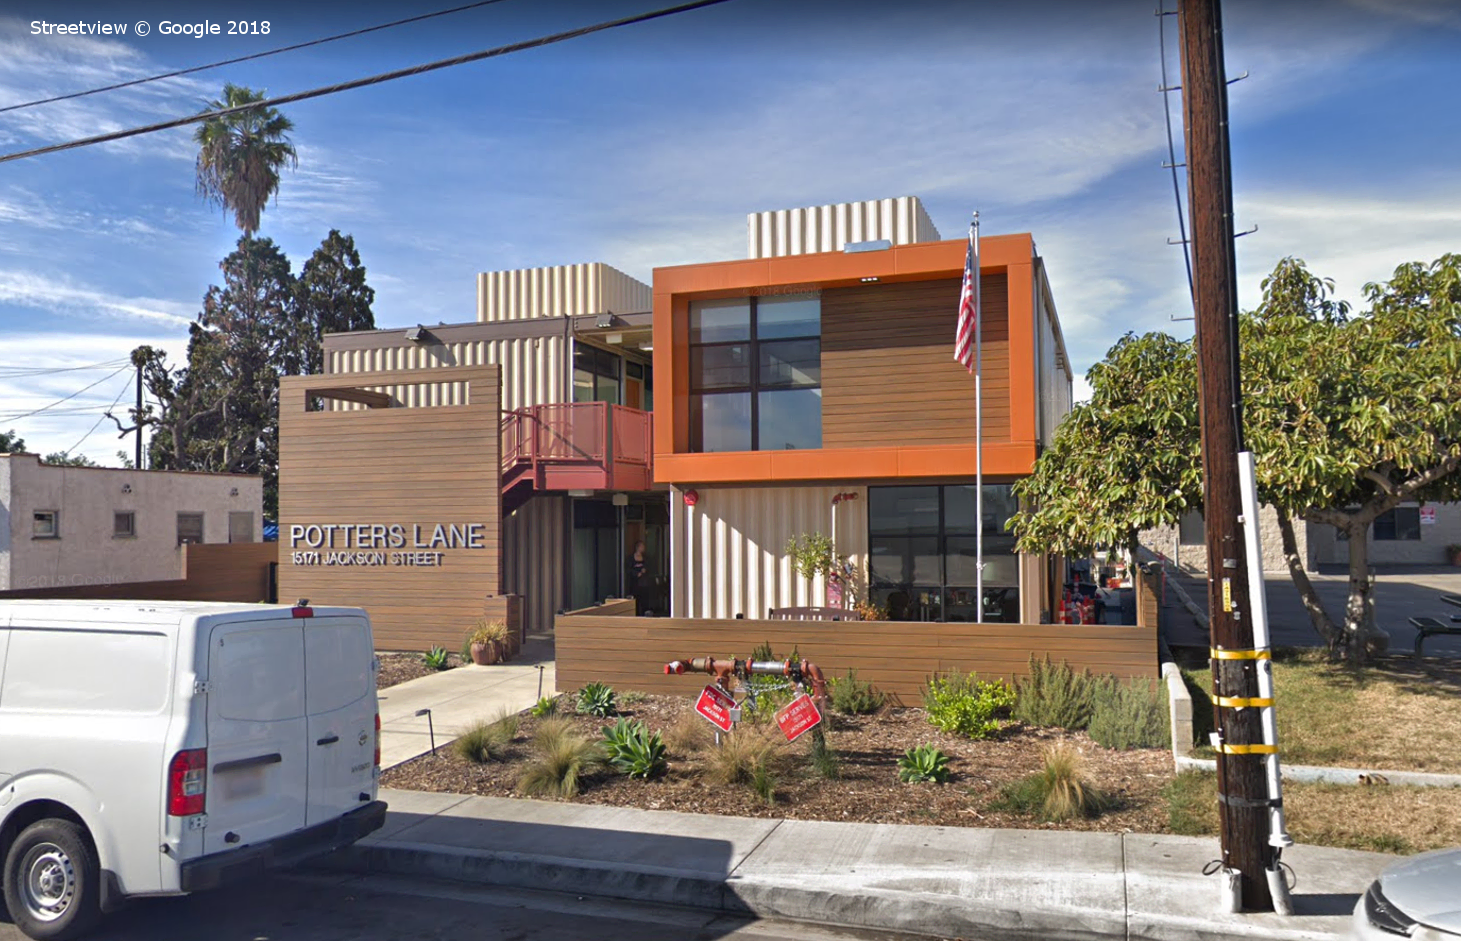 Potters Lane Veterans Housing, Google Streetview